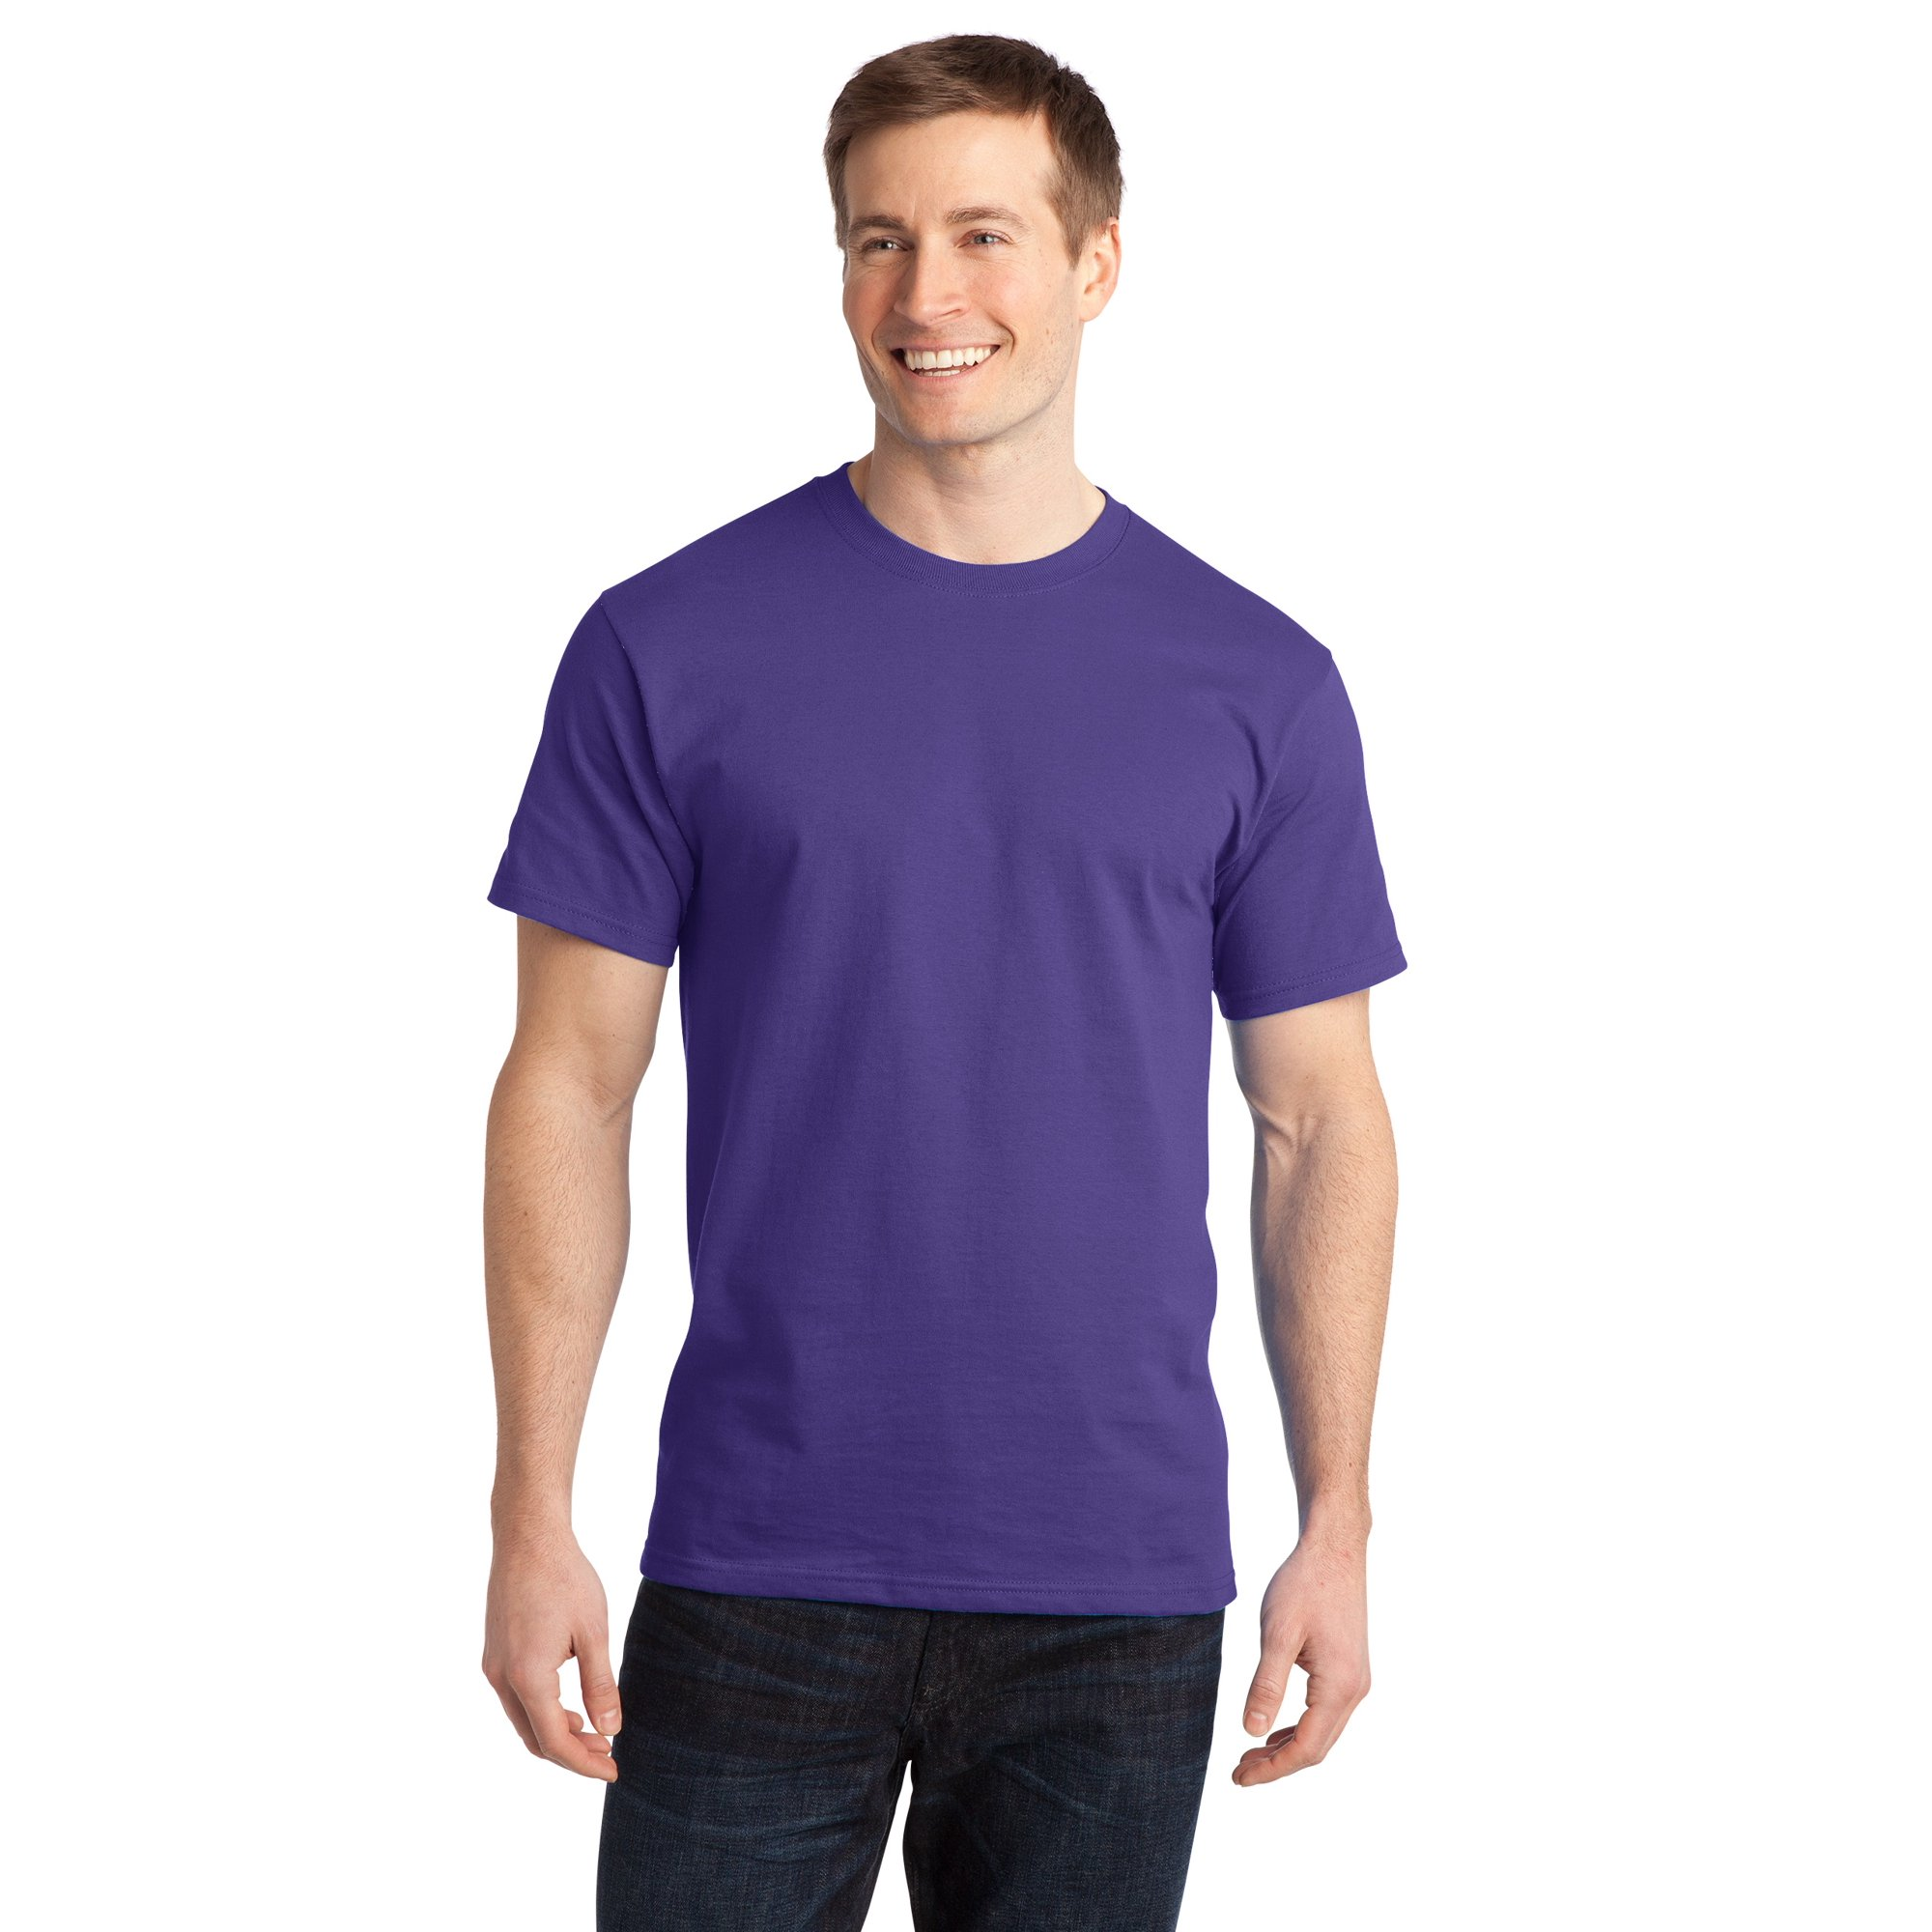 ea372fb4325be Sportoli Men s Essential Basic 100% Cotton Crew Neck Short Sleeve Long T- Shirt